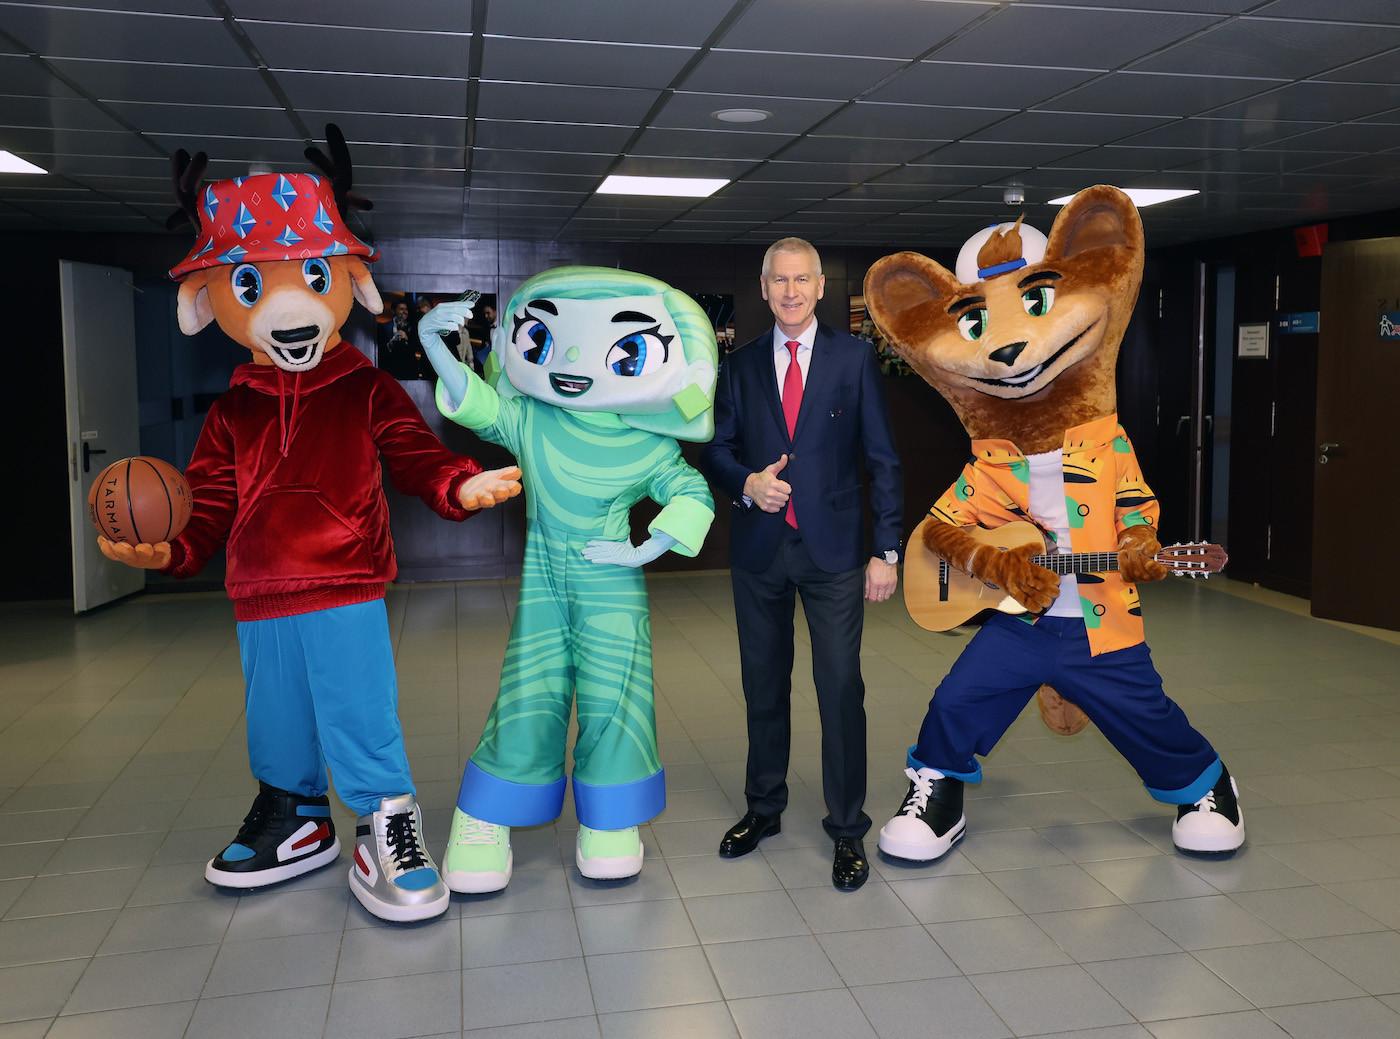 Yekaterinburg 2023 mascots Yaggy (left), Heaty and Cedry (right) pictured with FISU President Oleg Matytsin ©FISU